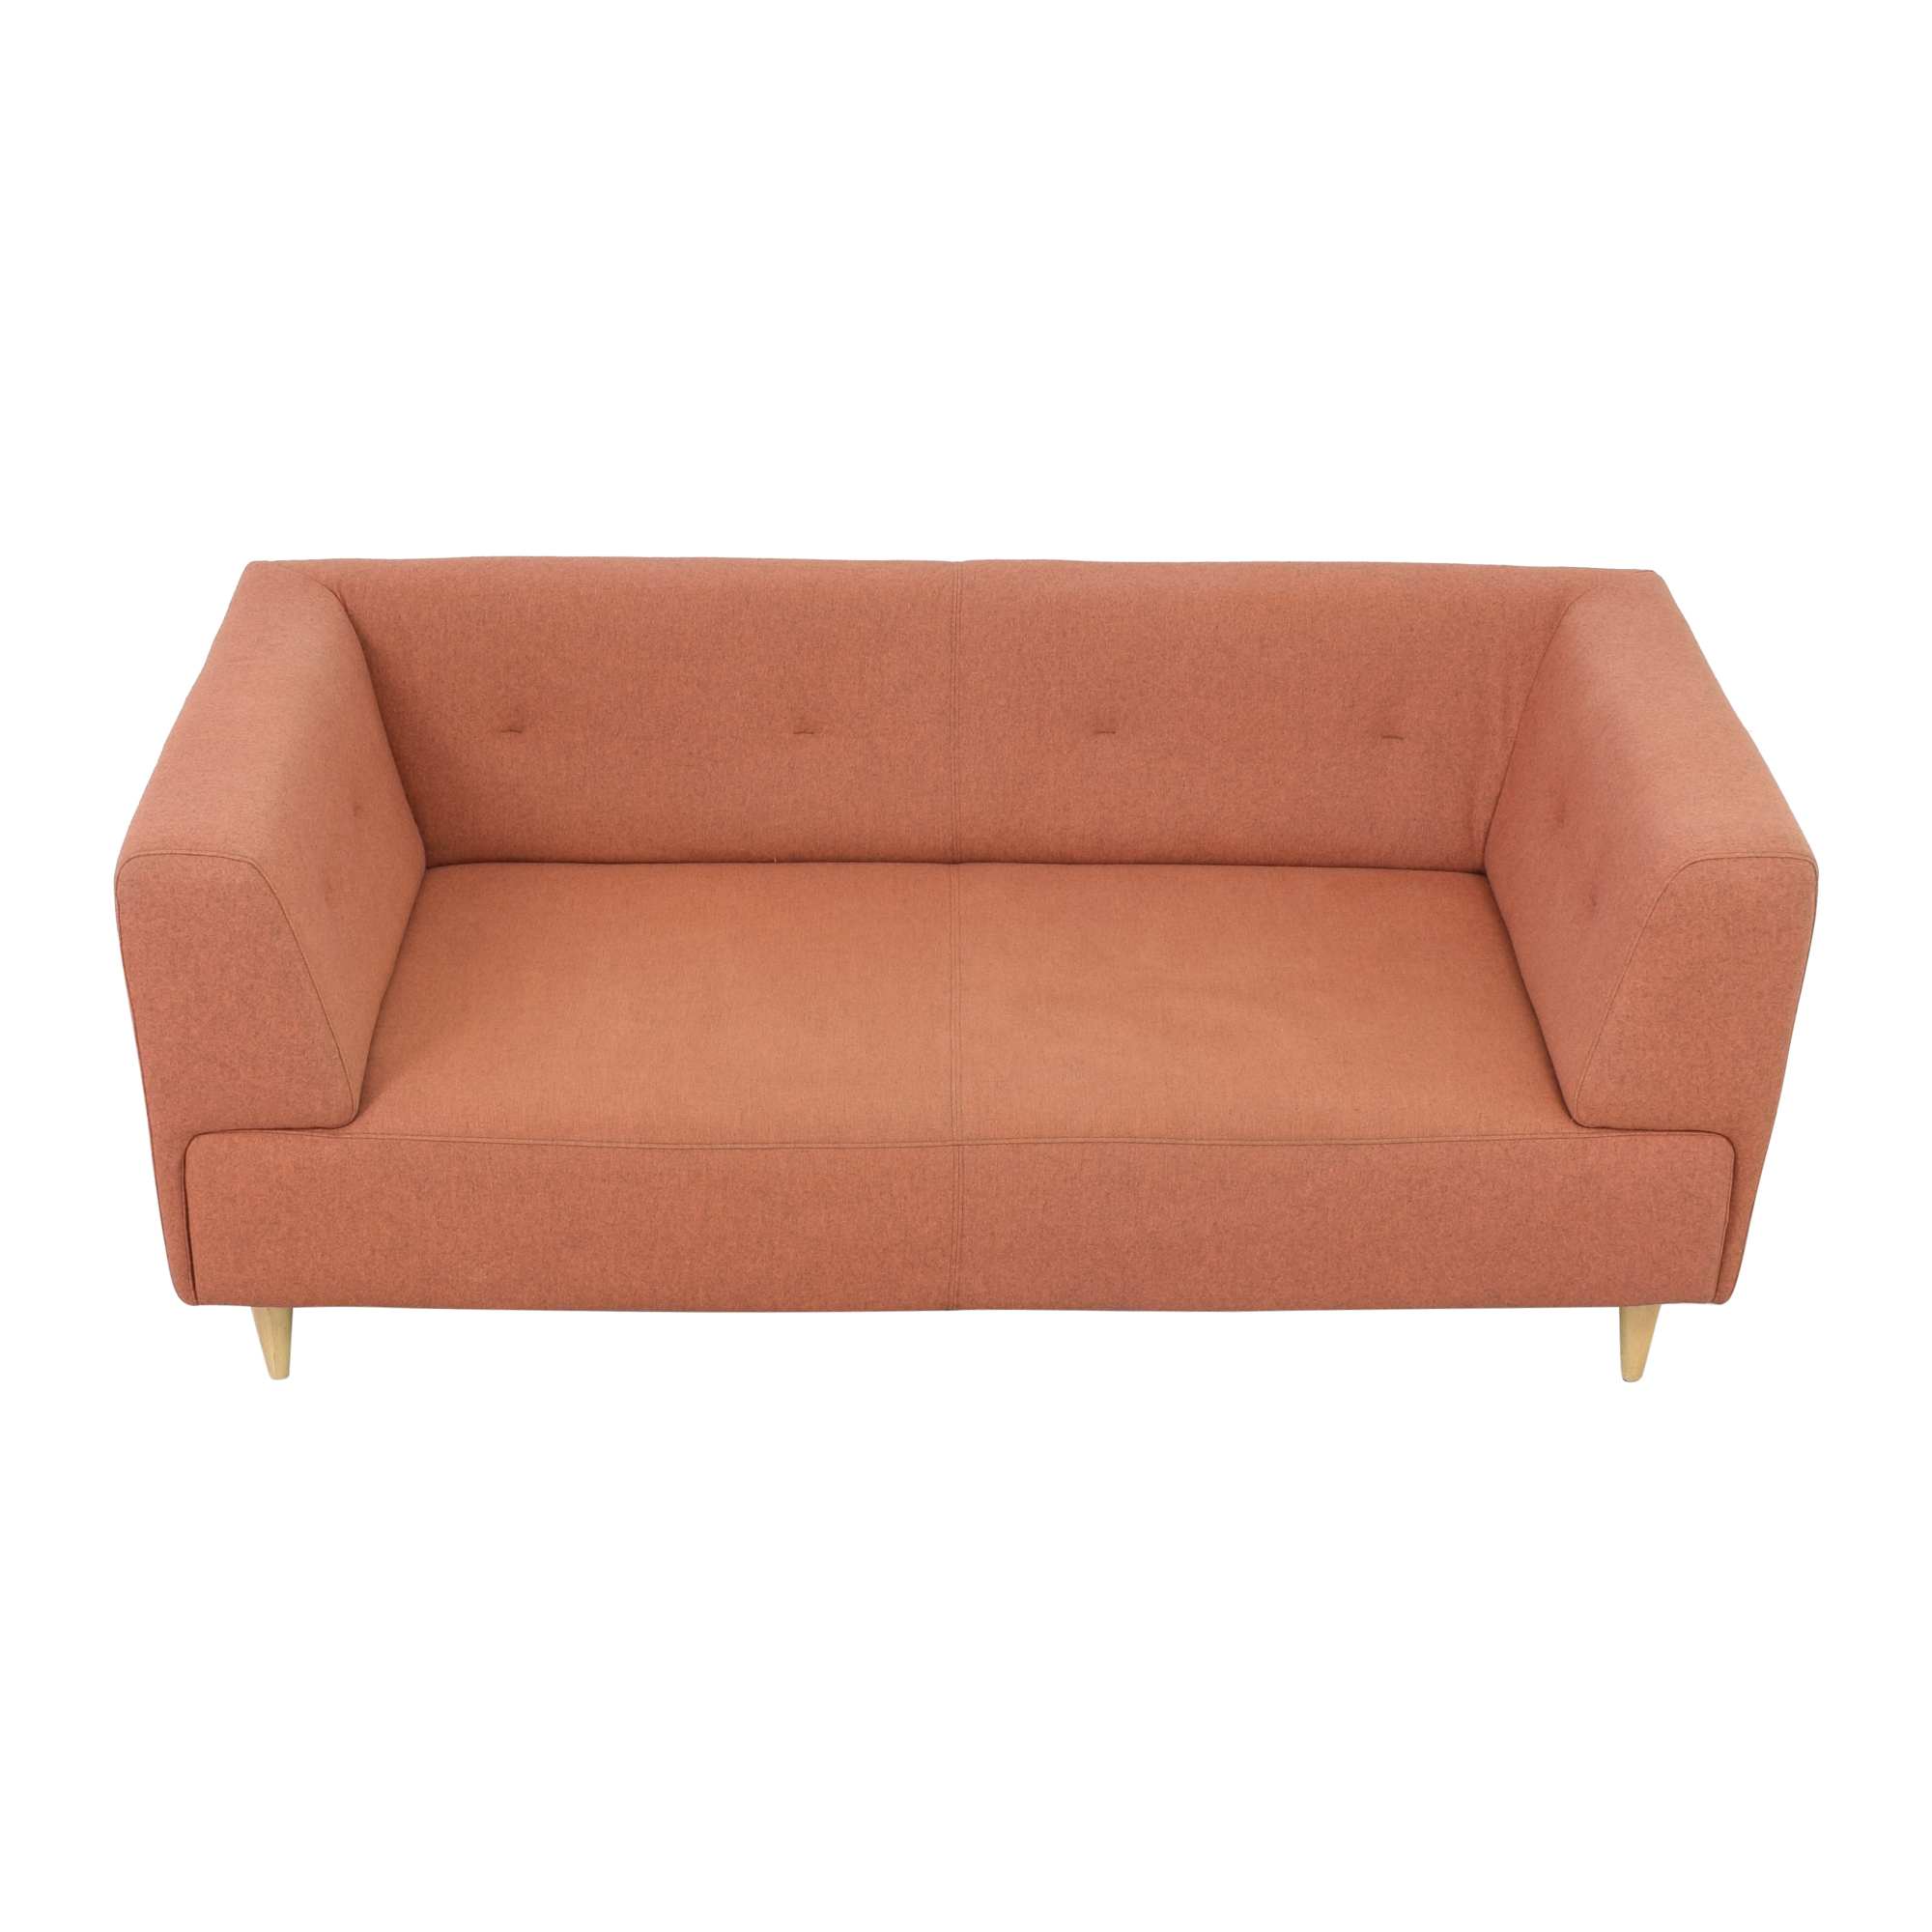 shop BoConcept BoConcept Two Seater Sofa online